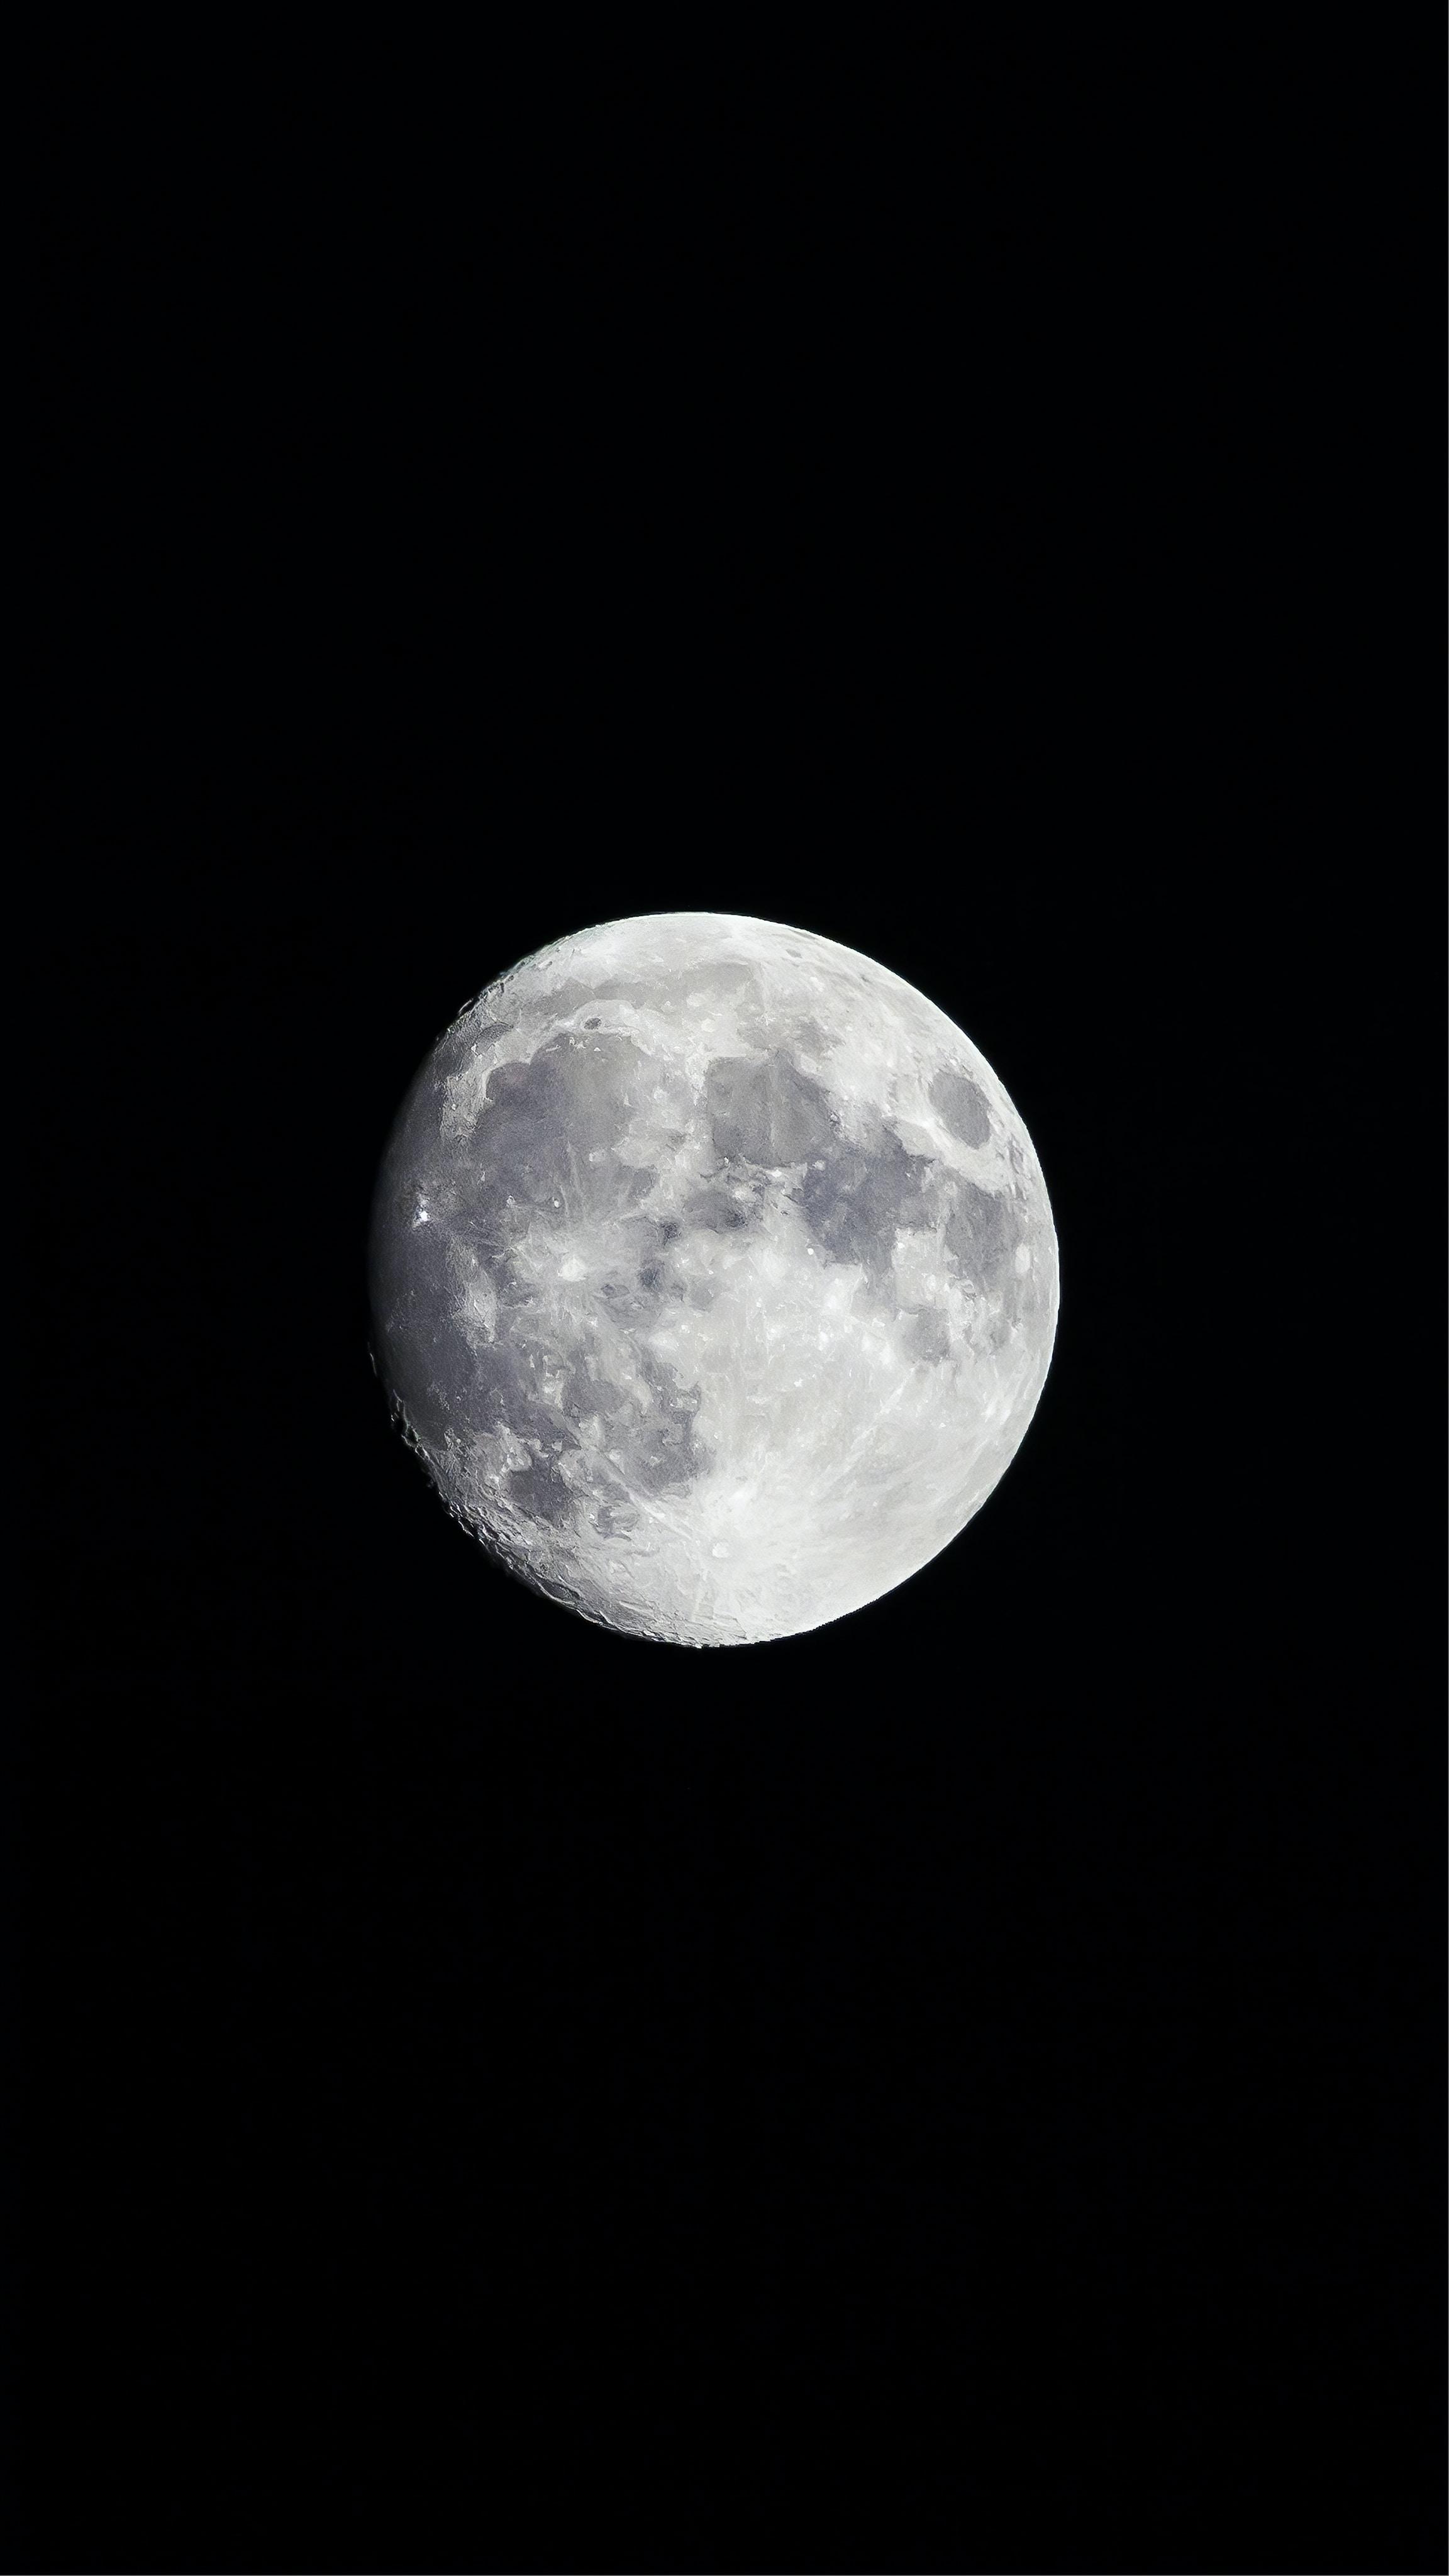 moon at nighttime